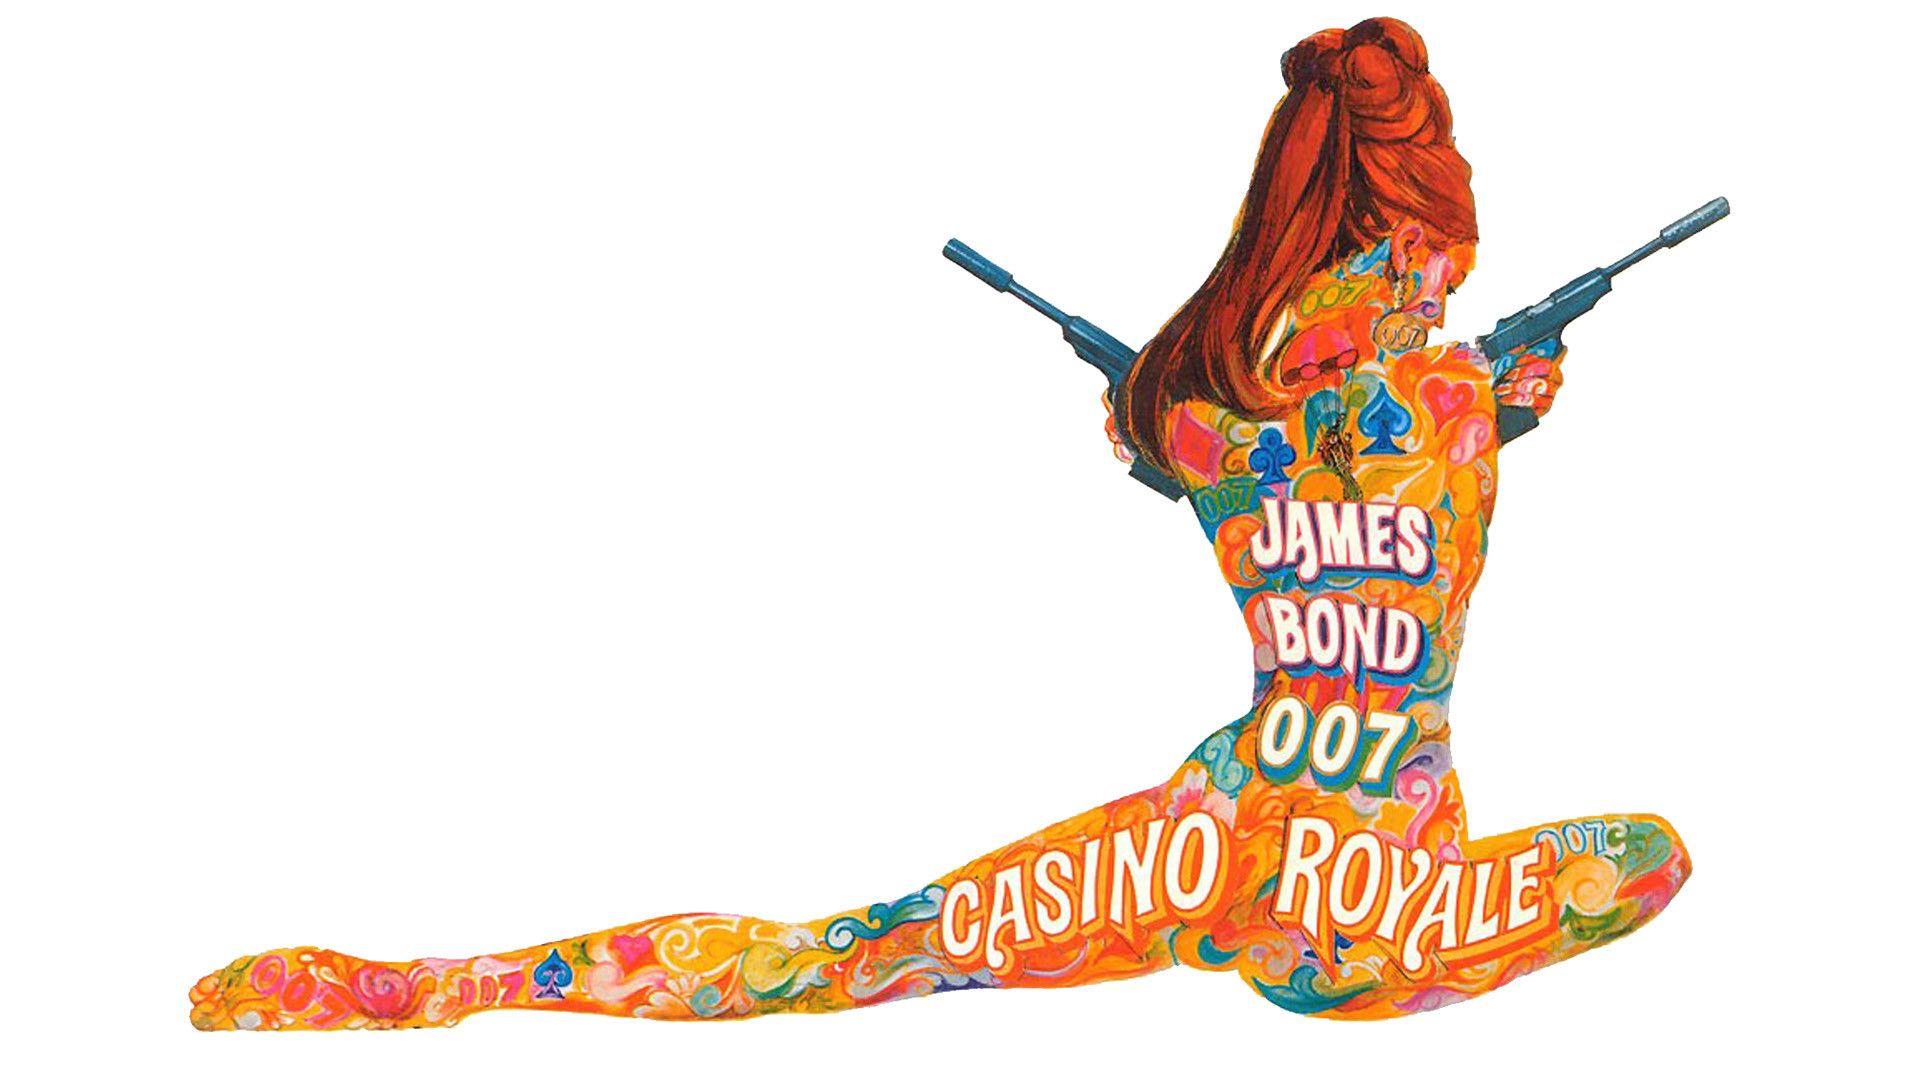 casino royale wallpaper poster - photo #25